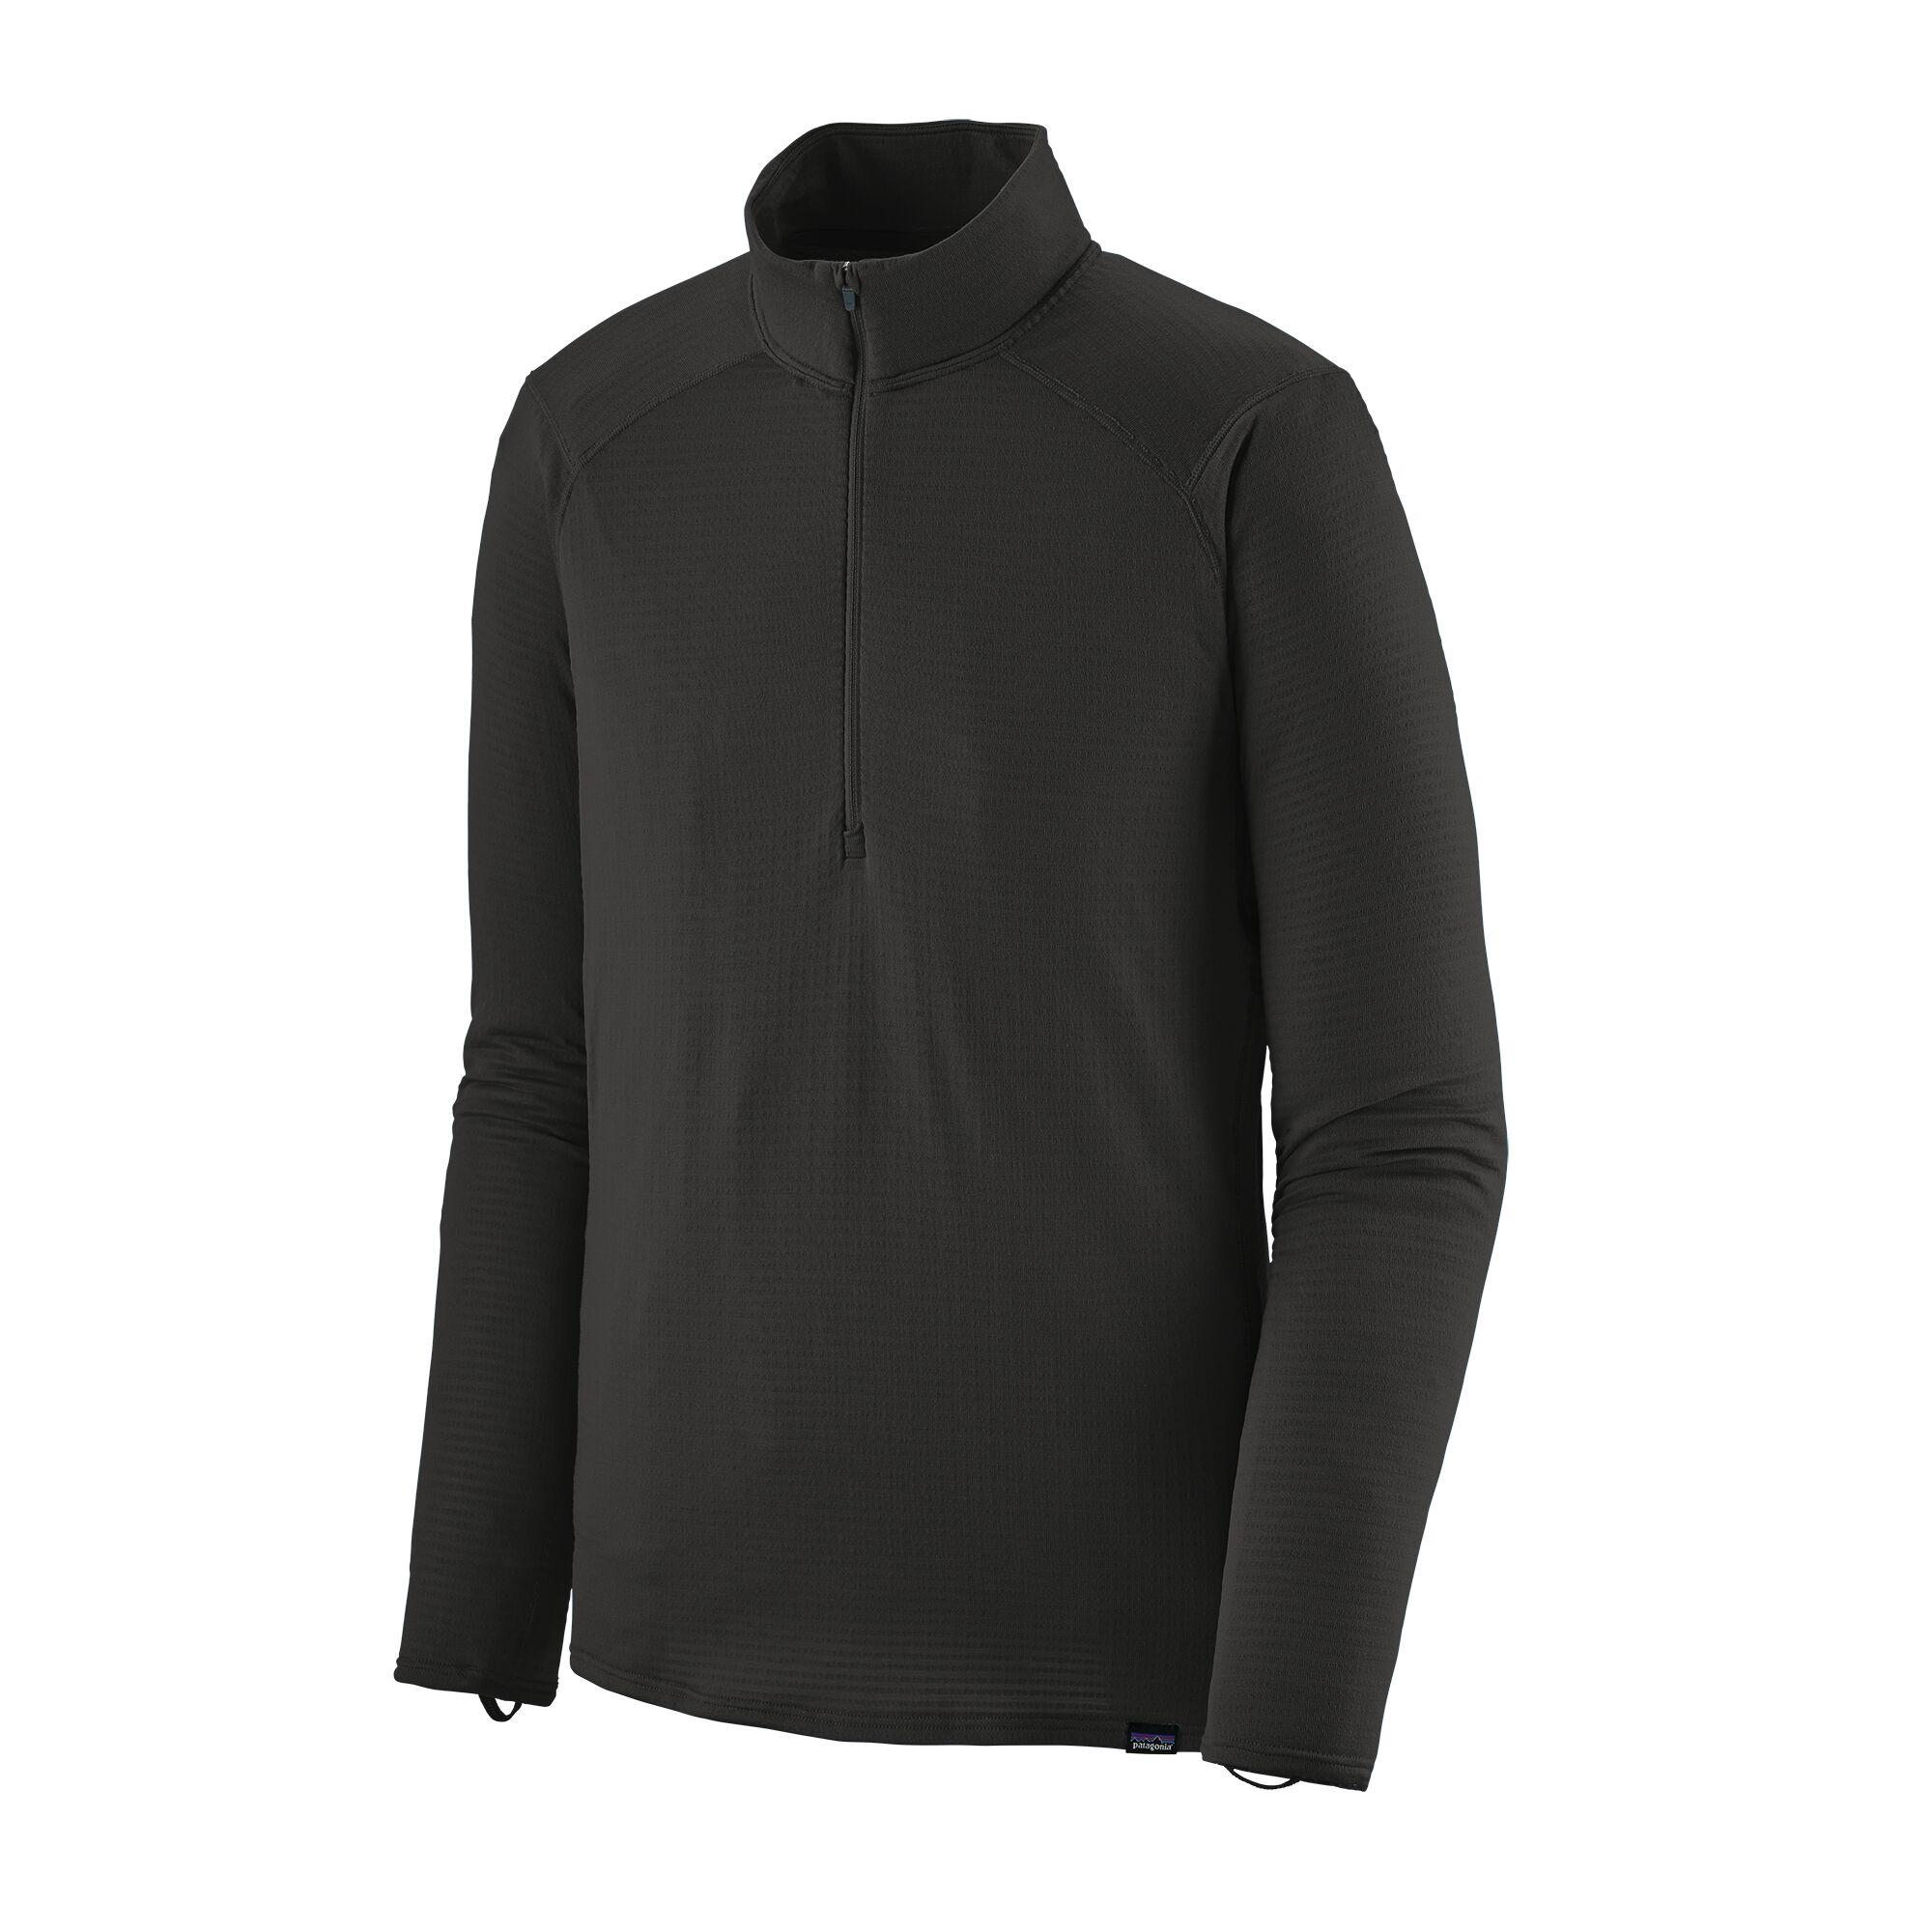 Patagonia - Capilene Thermal Weight Zip Neck - Camiseta técnica - Hombre